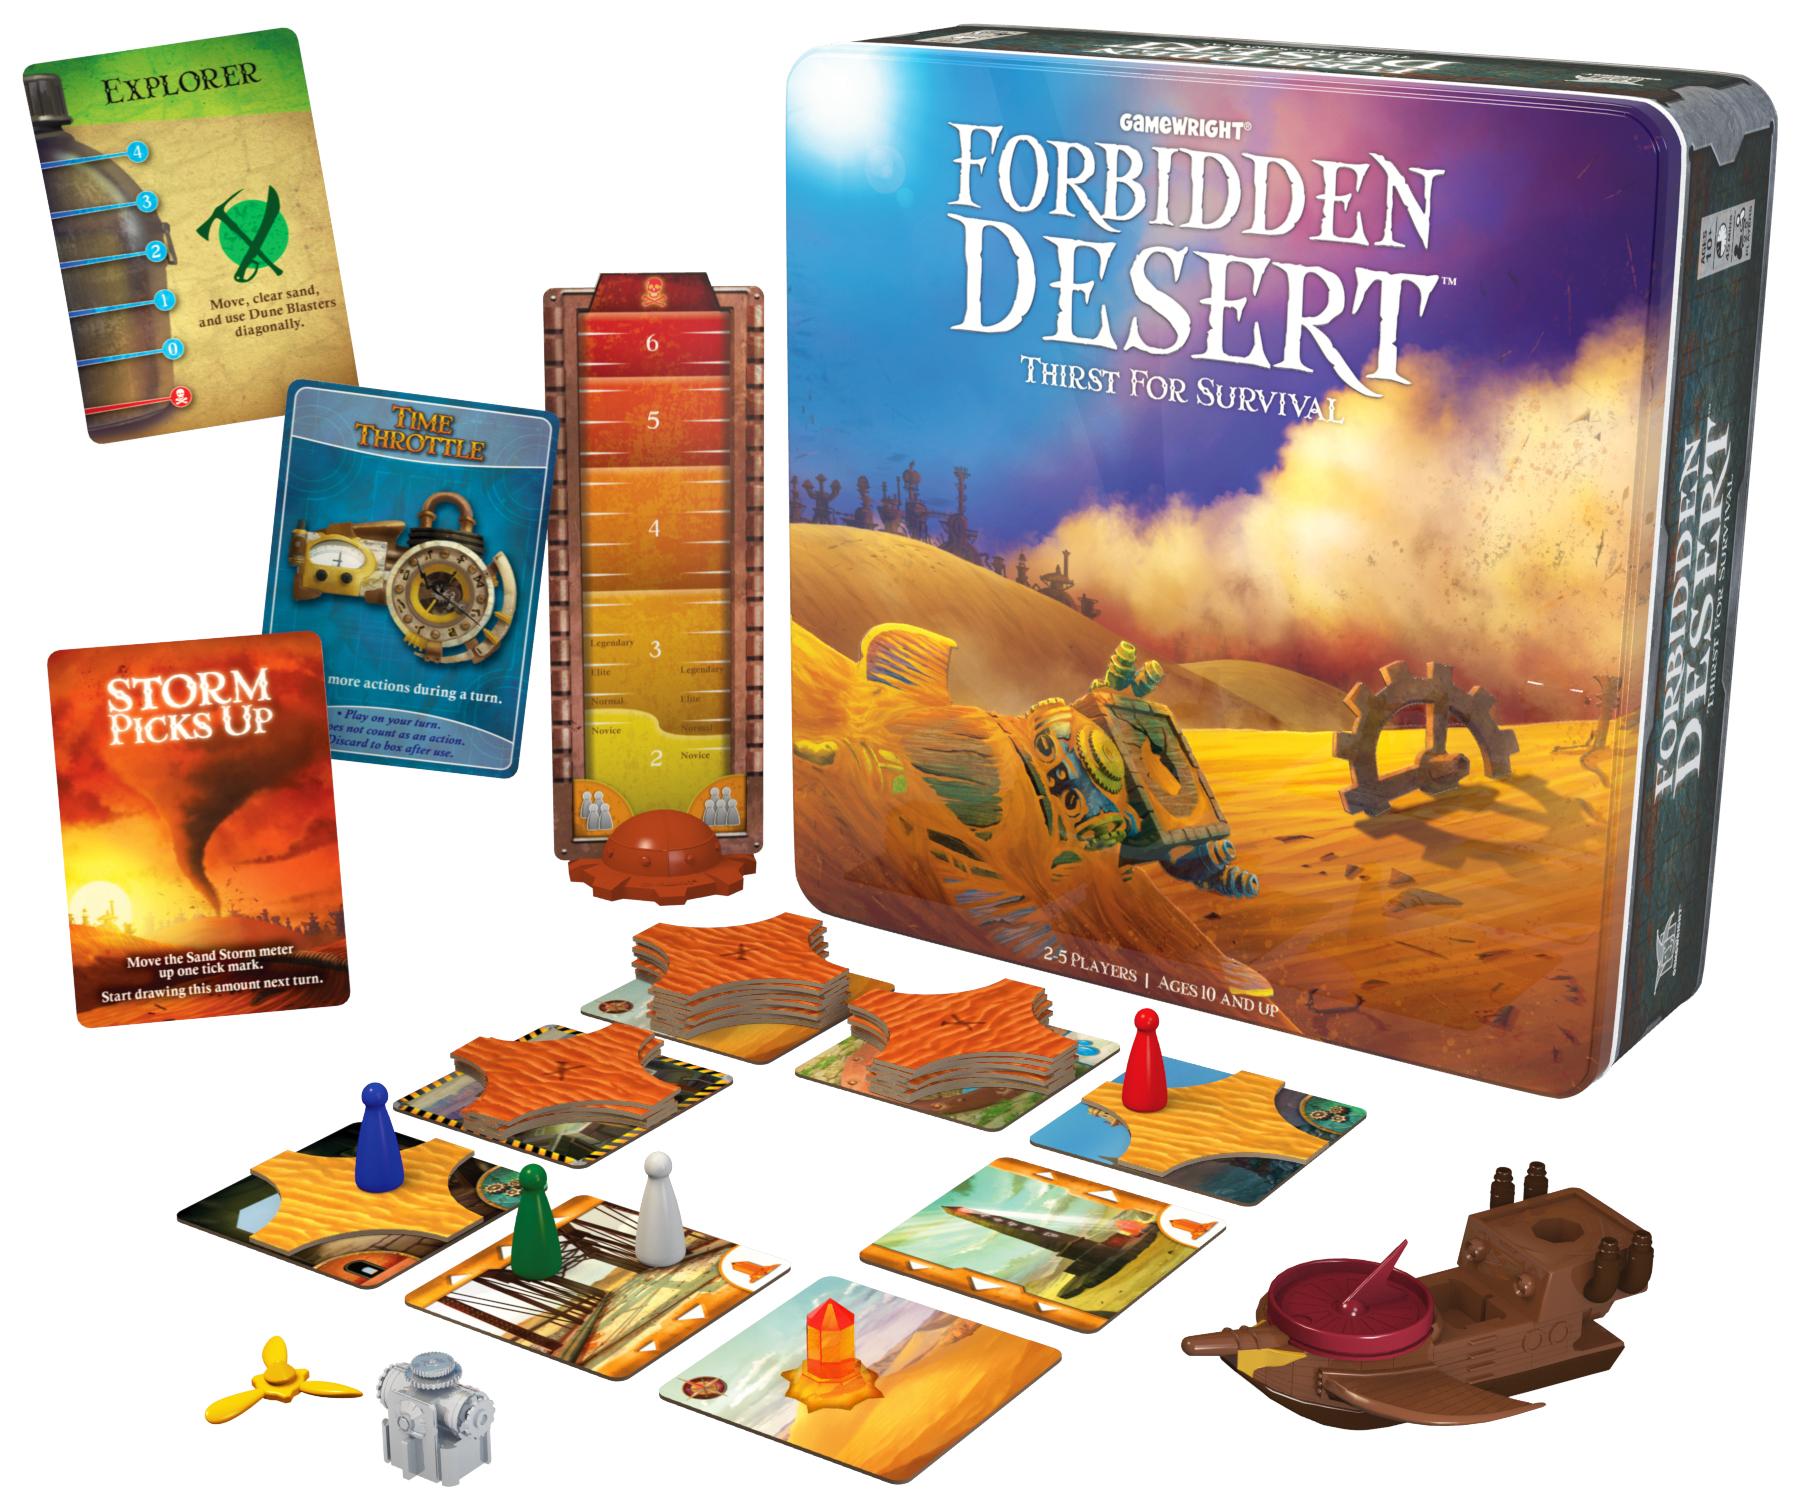 Forbidden DesertTM